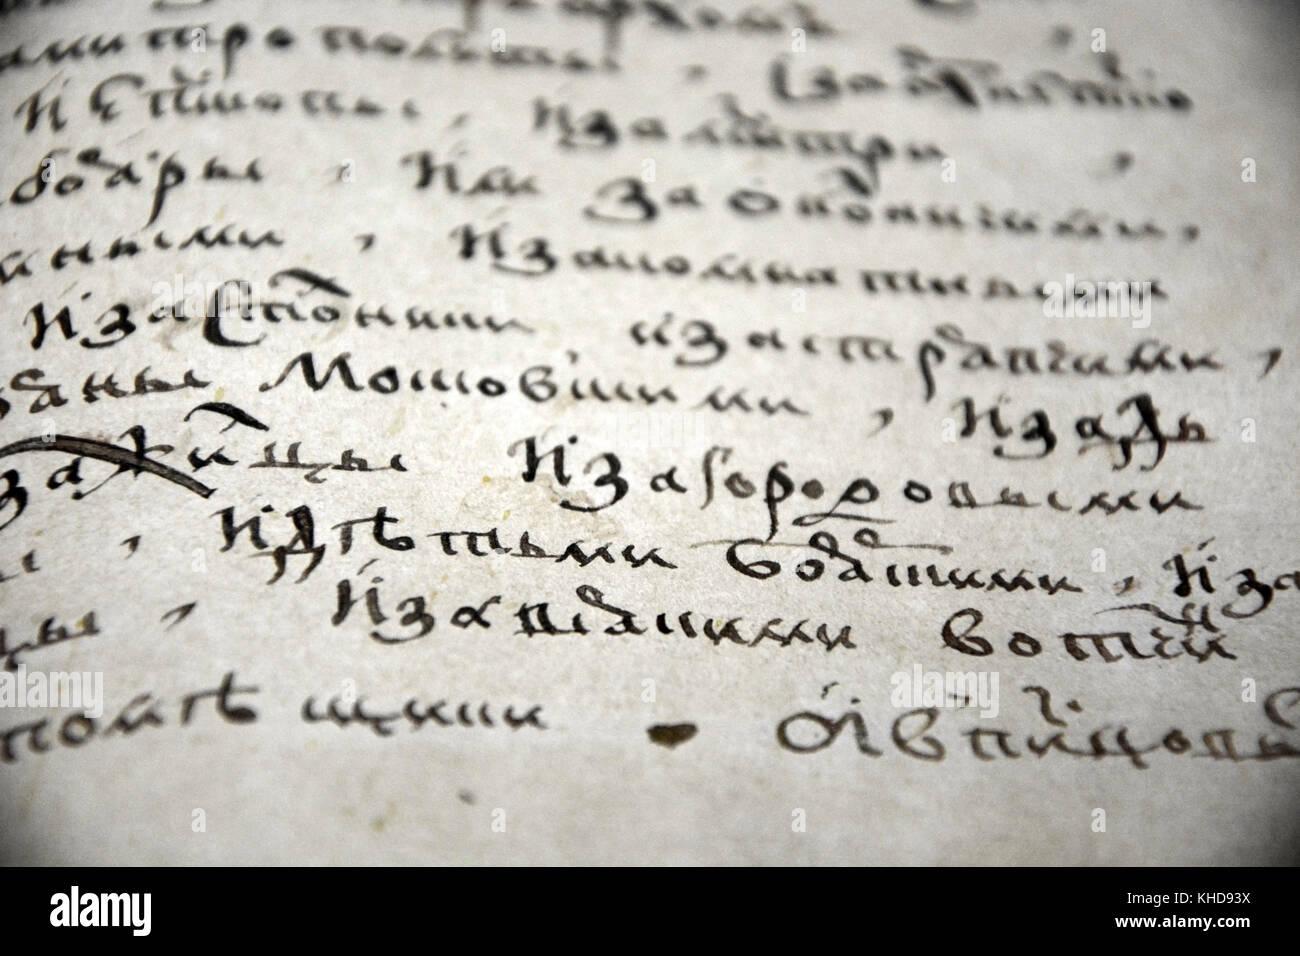 VELIKY NOVGOROD, RUSSIA - FEBRUARY 22, 2015: Old monks manuscript written with ink on February 22, 2015 in Veliky - Stock Image